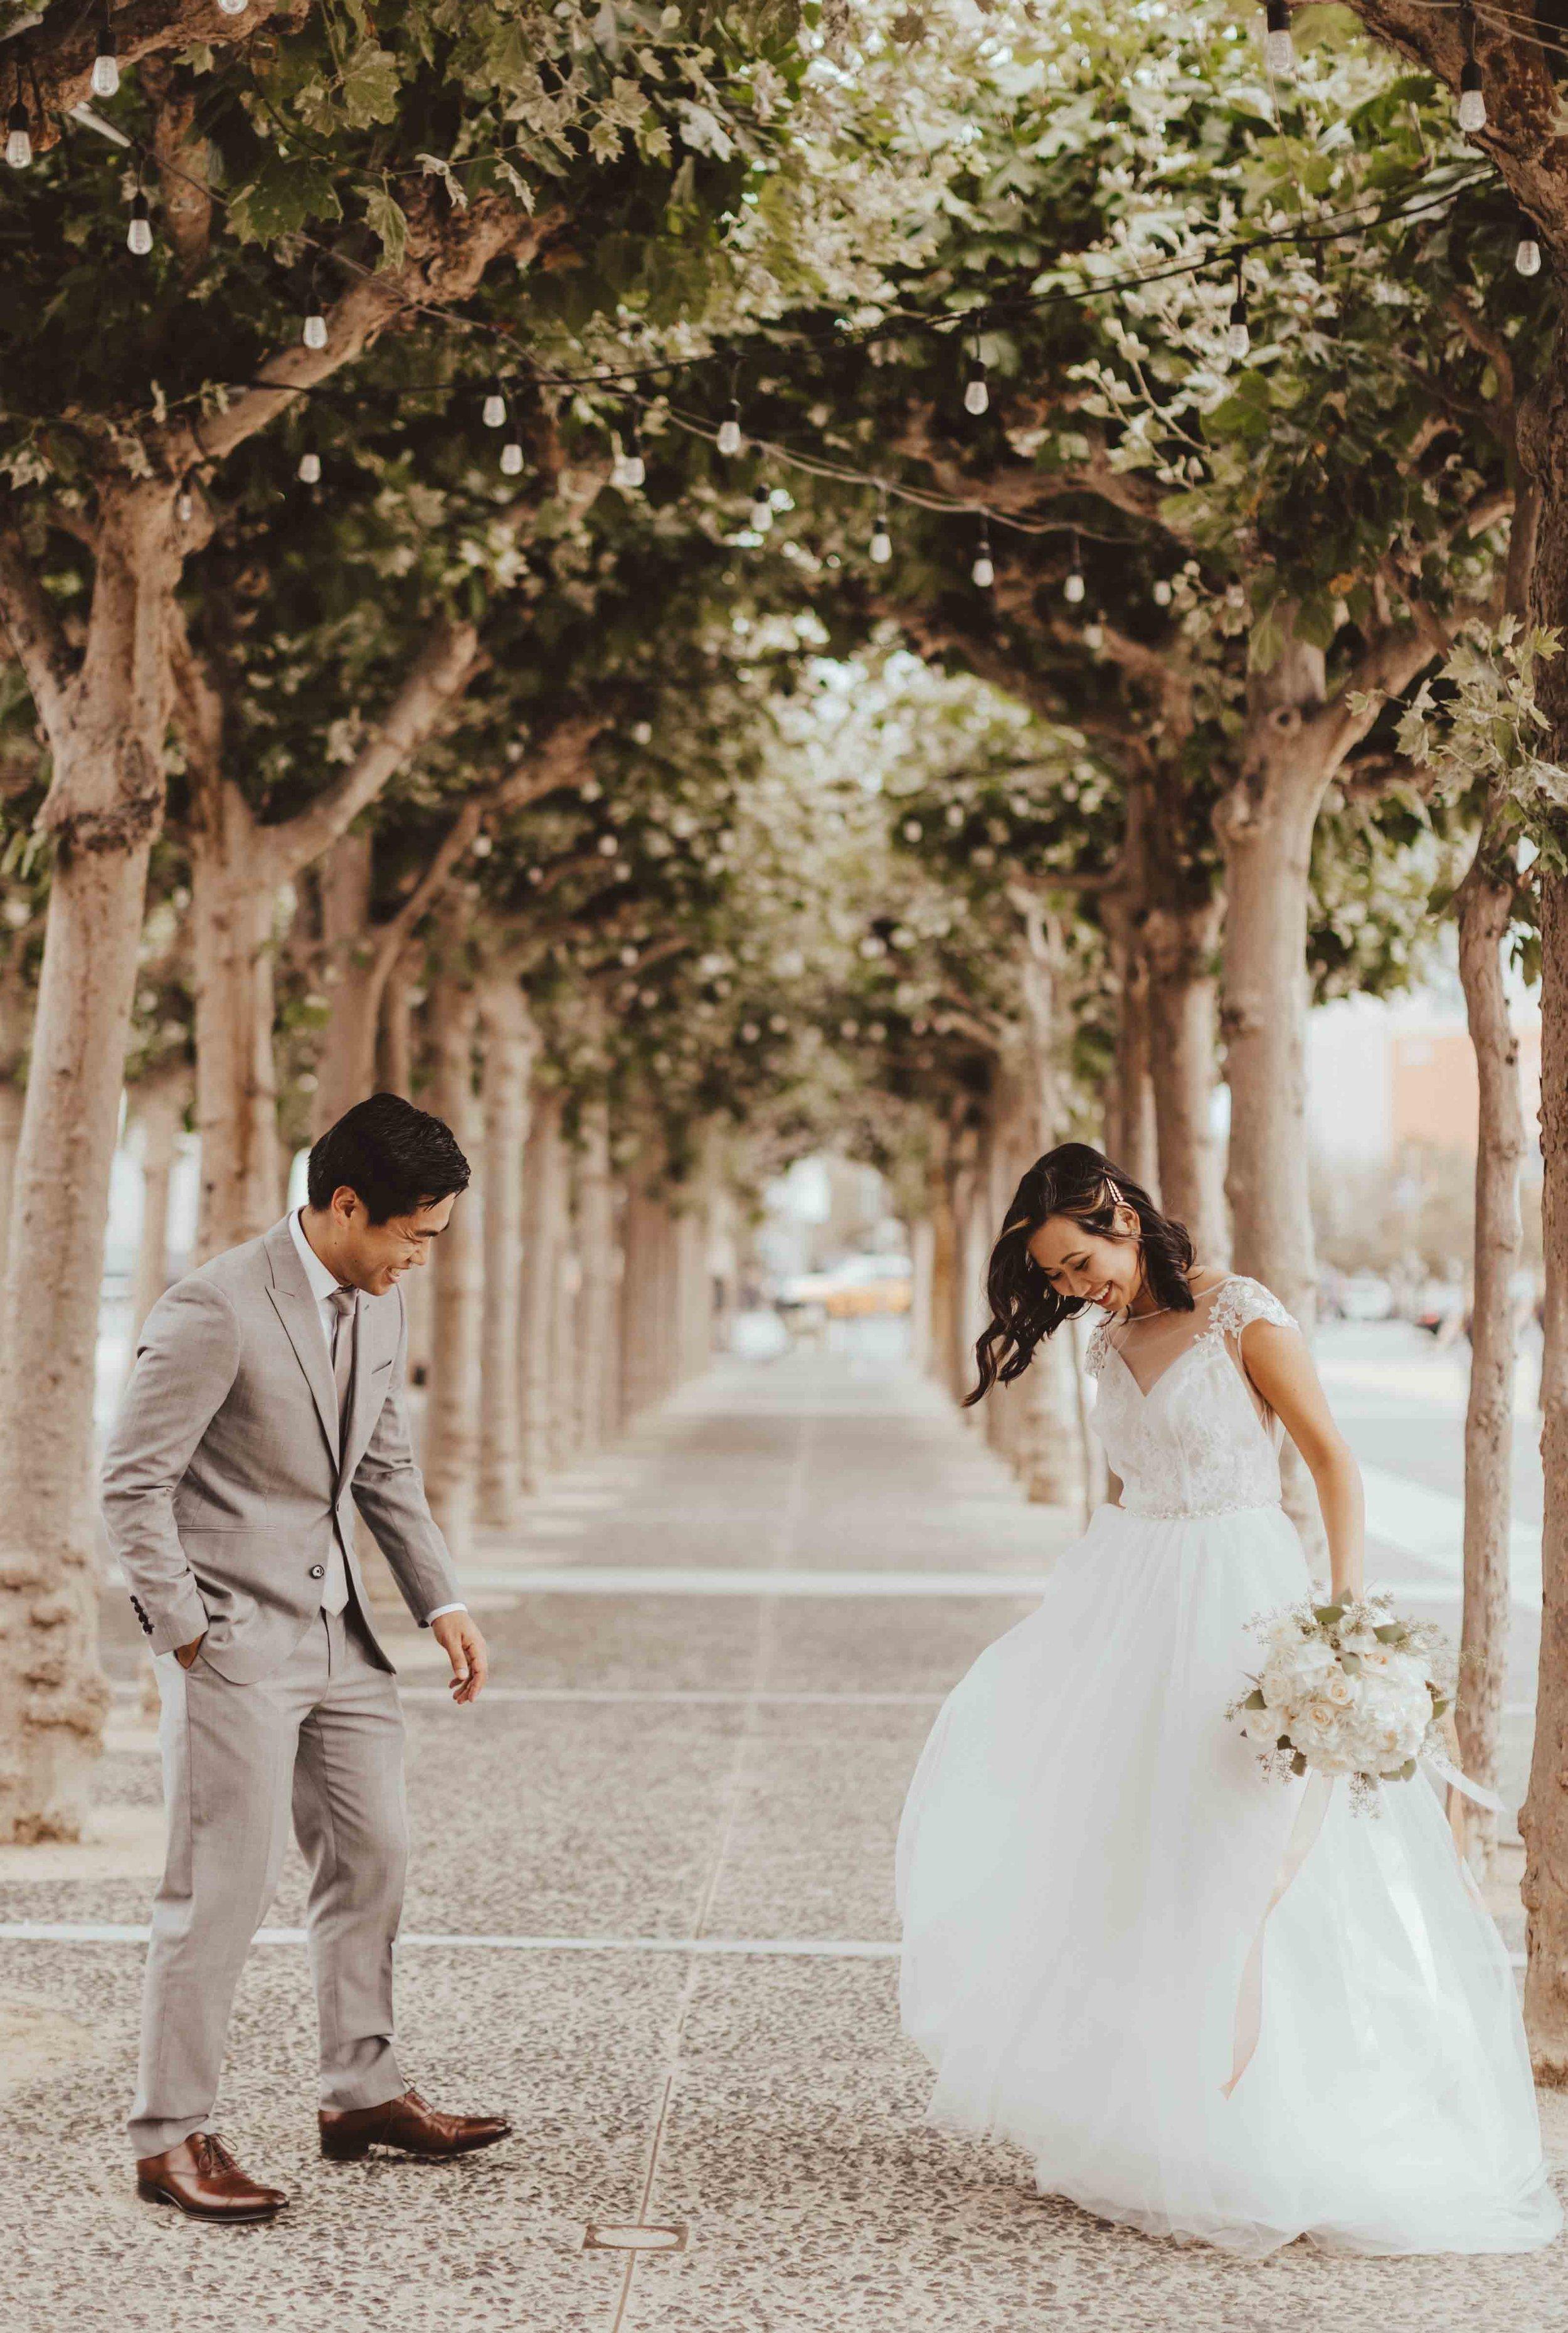 weddingday (8 of 67).jpg